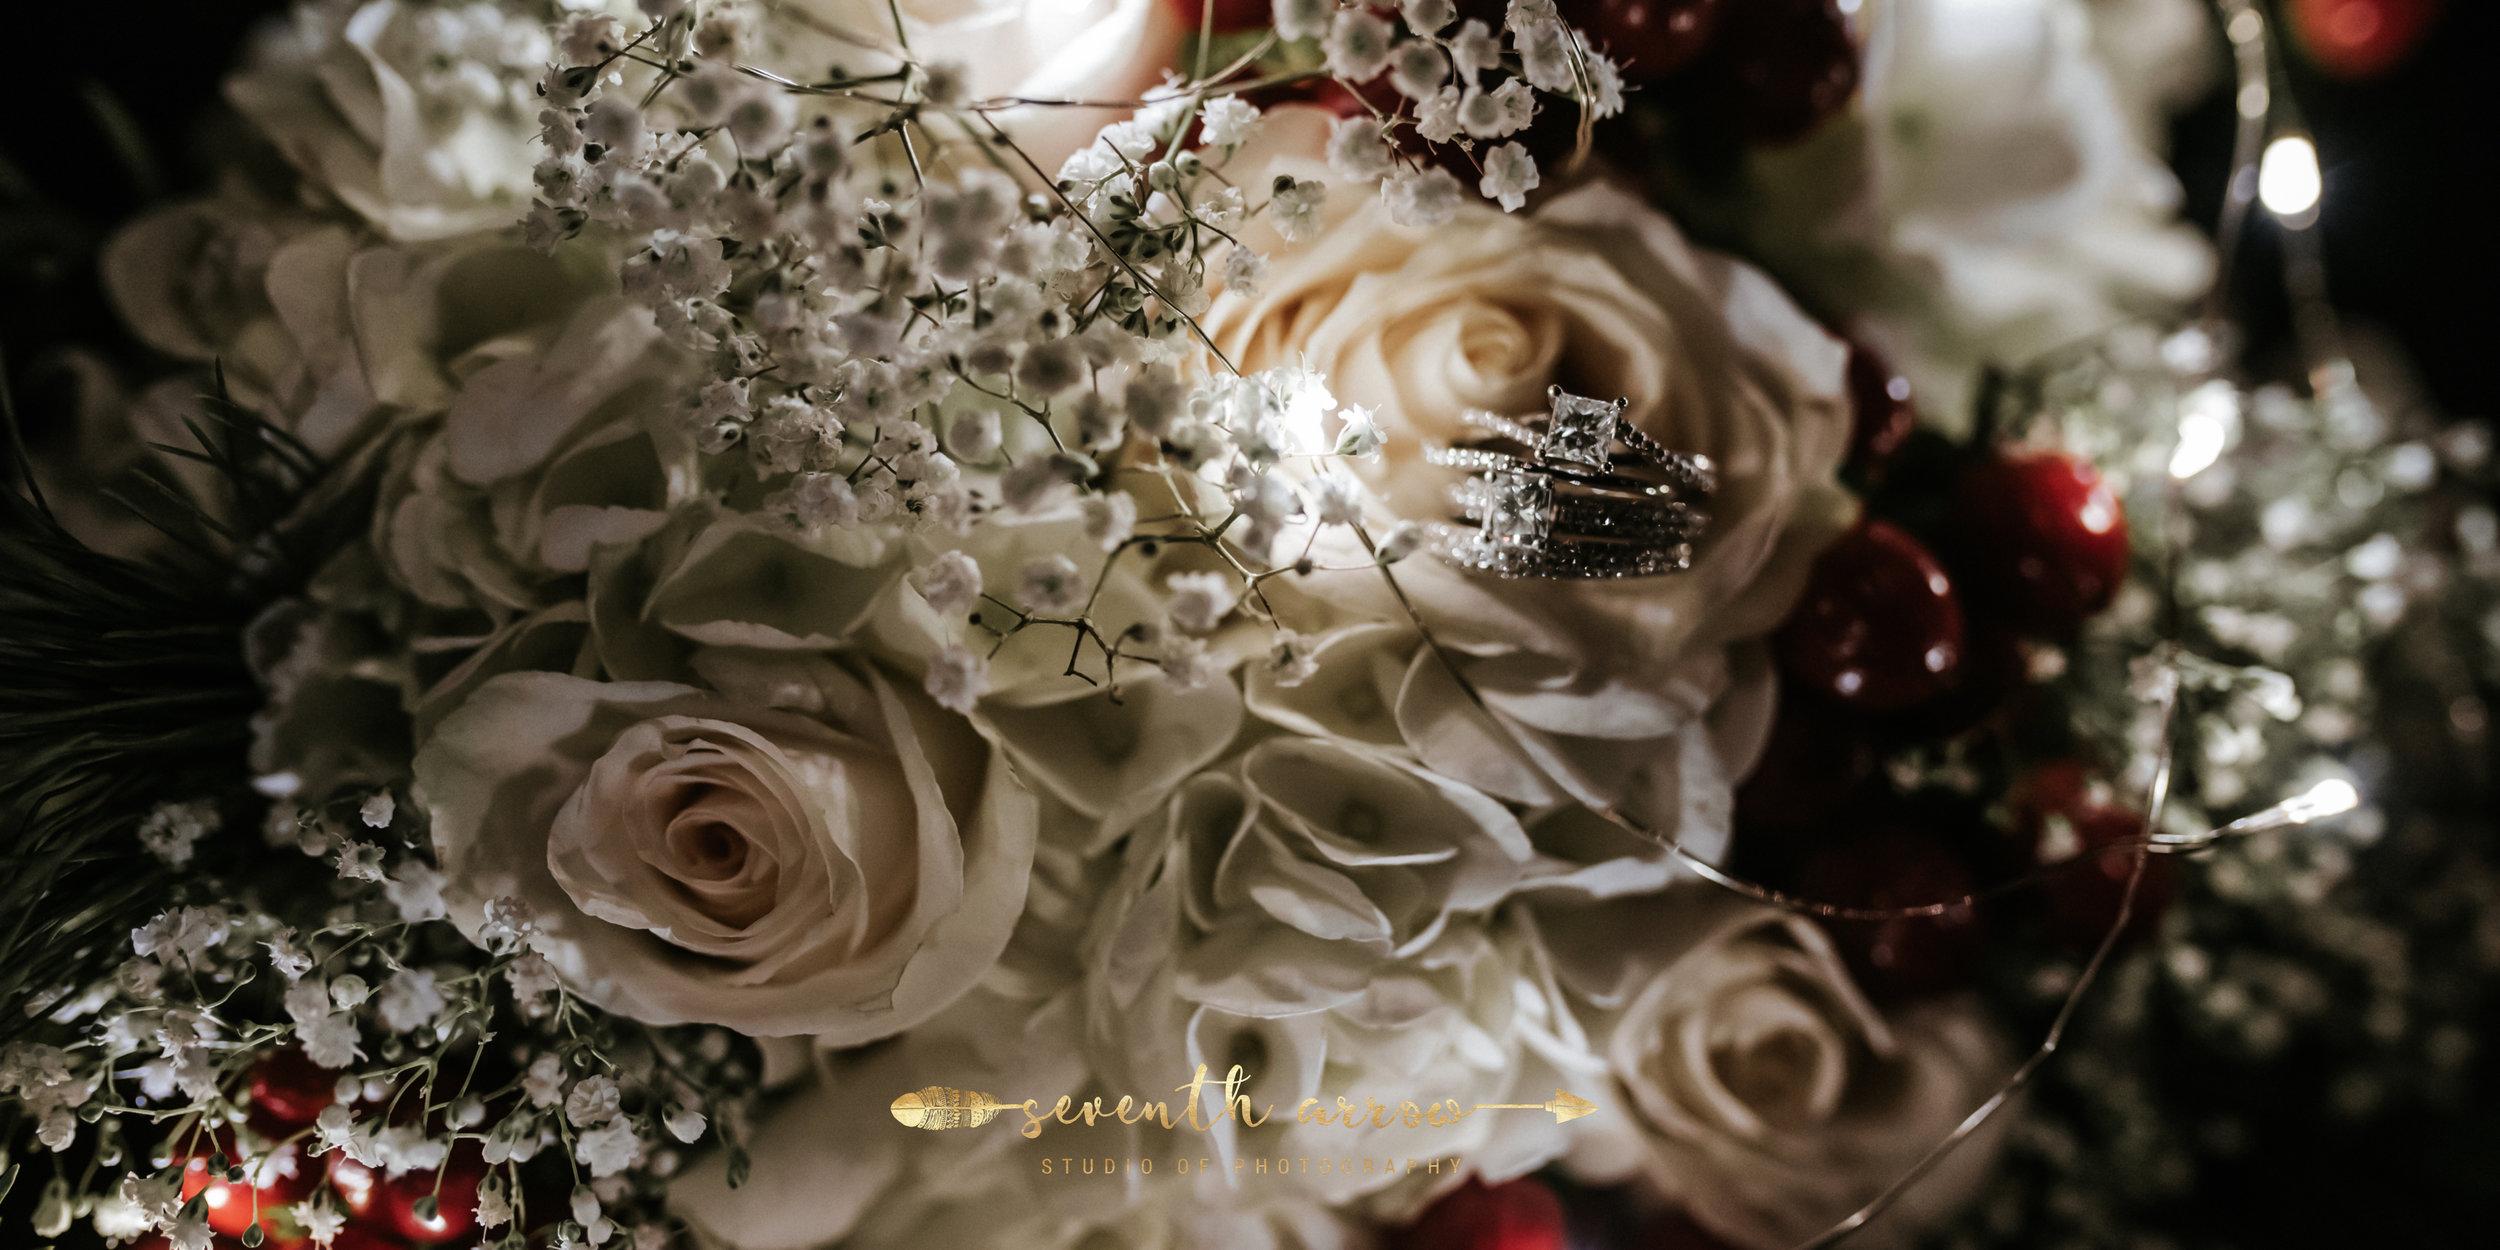 Holidayvallleyweddingbuffalophotography-02.jpg